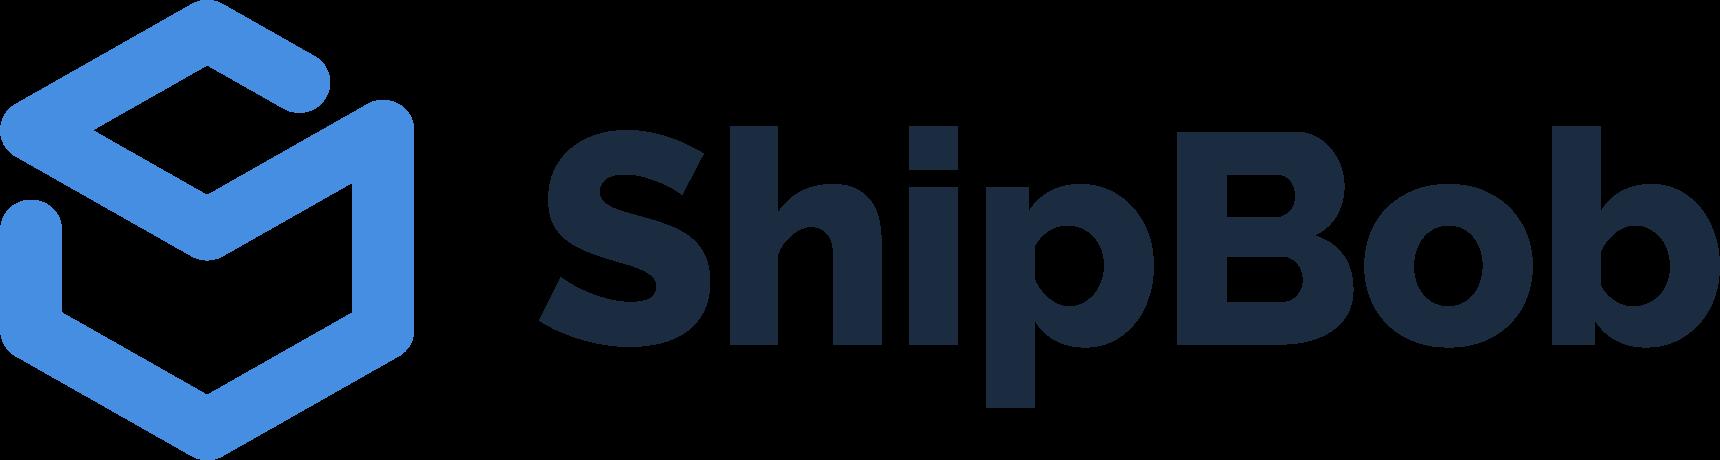 shipbob-logo.png